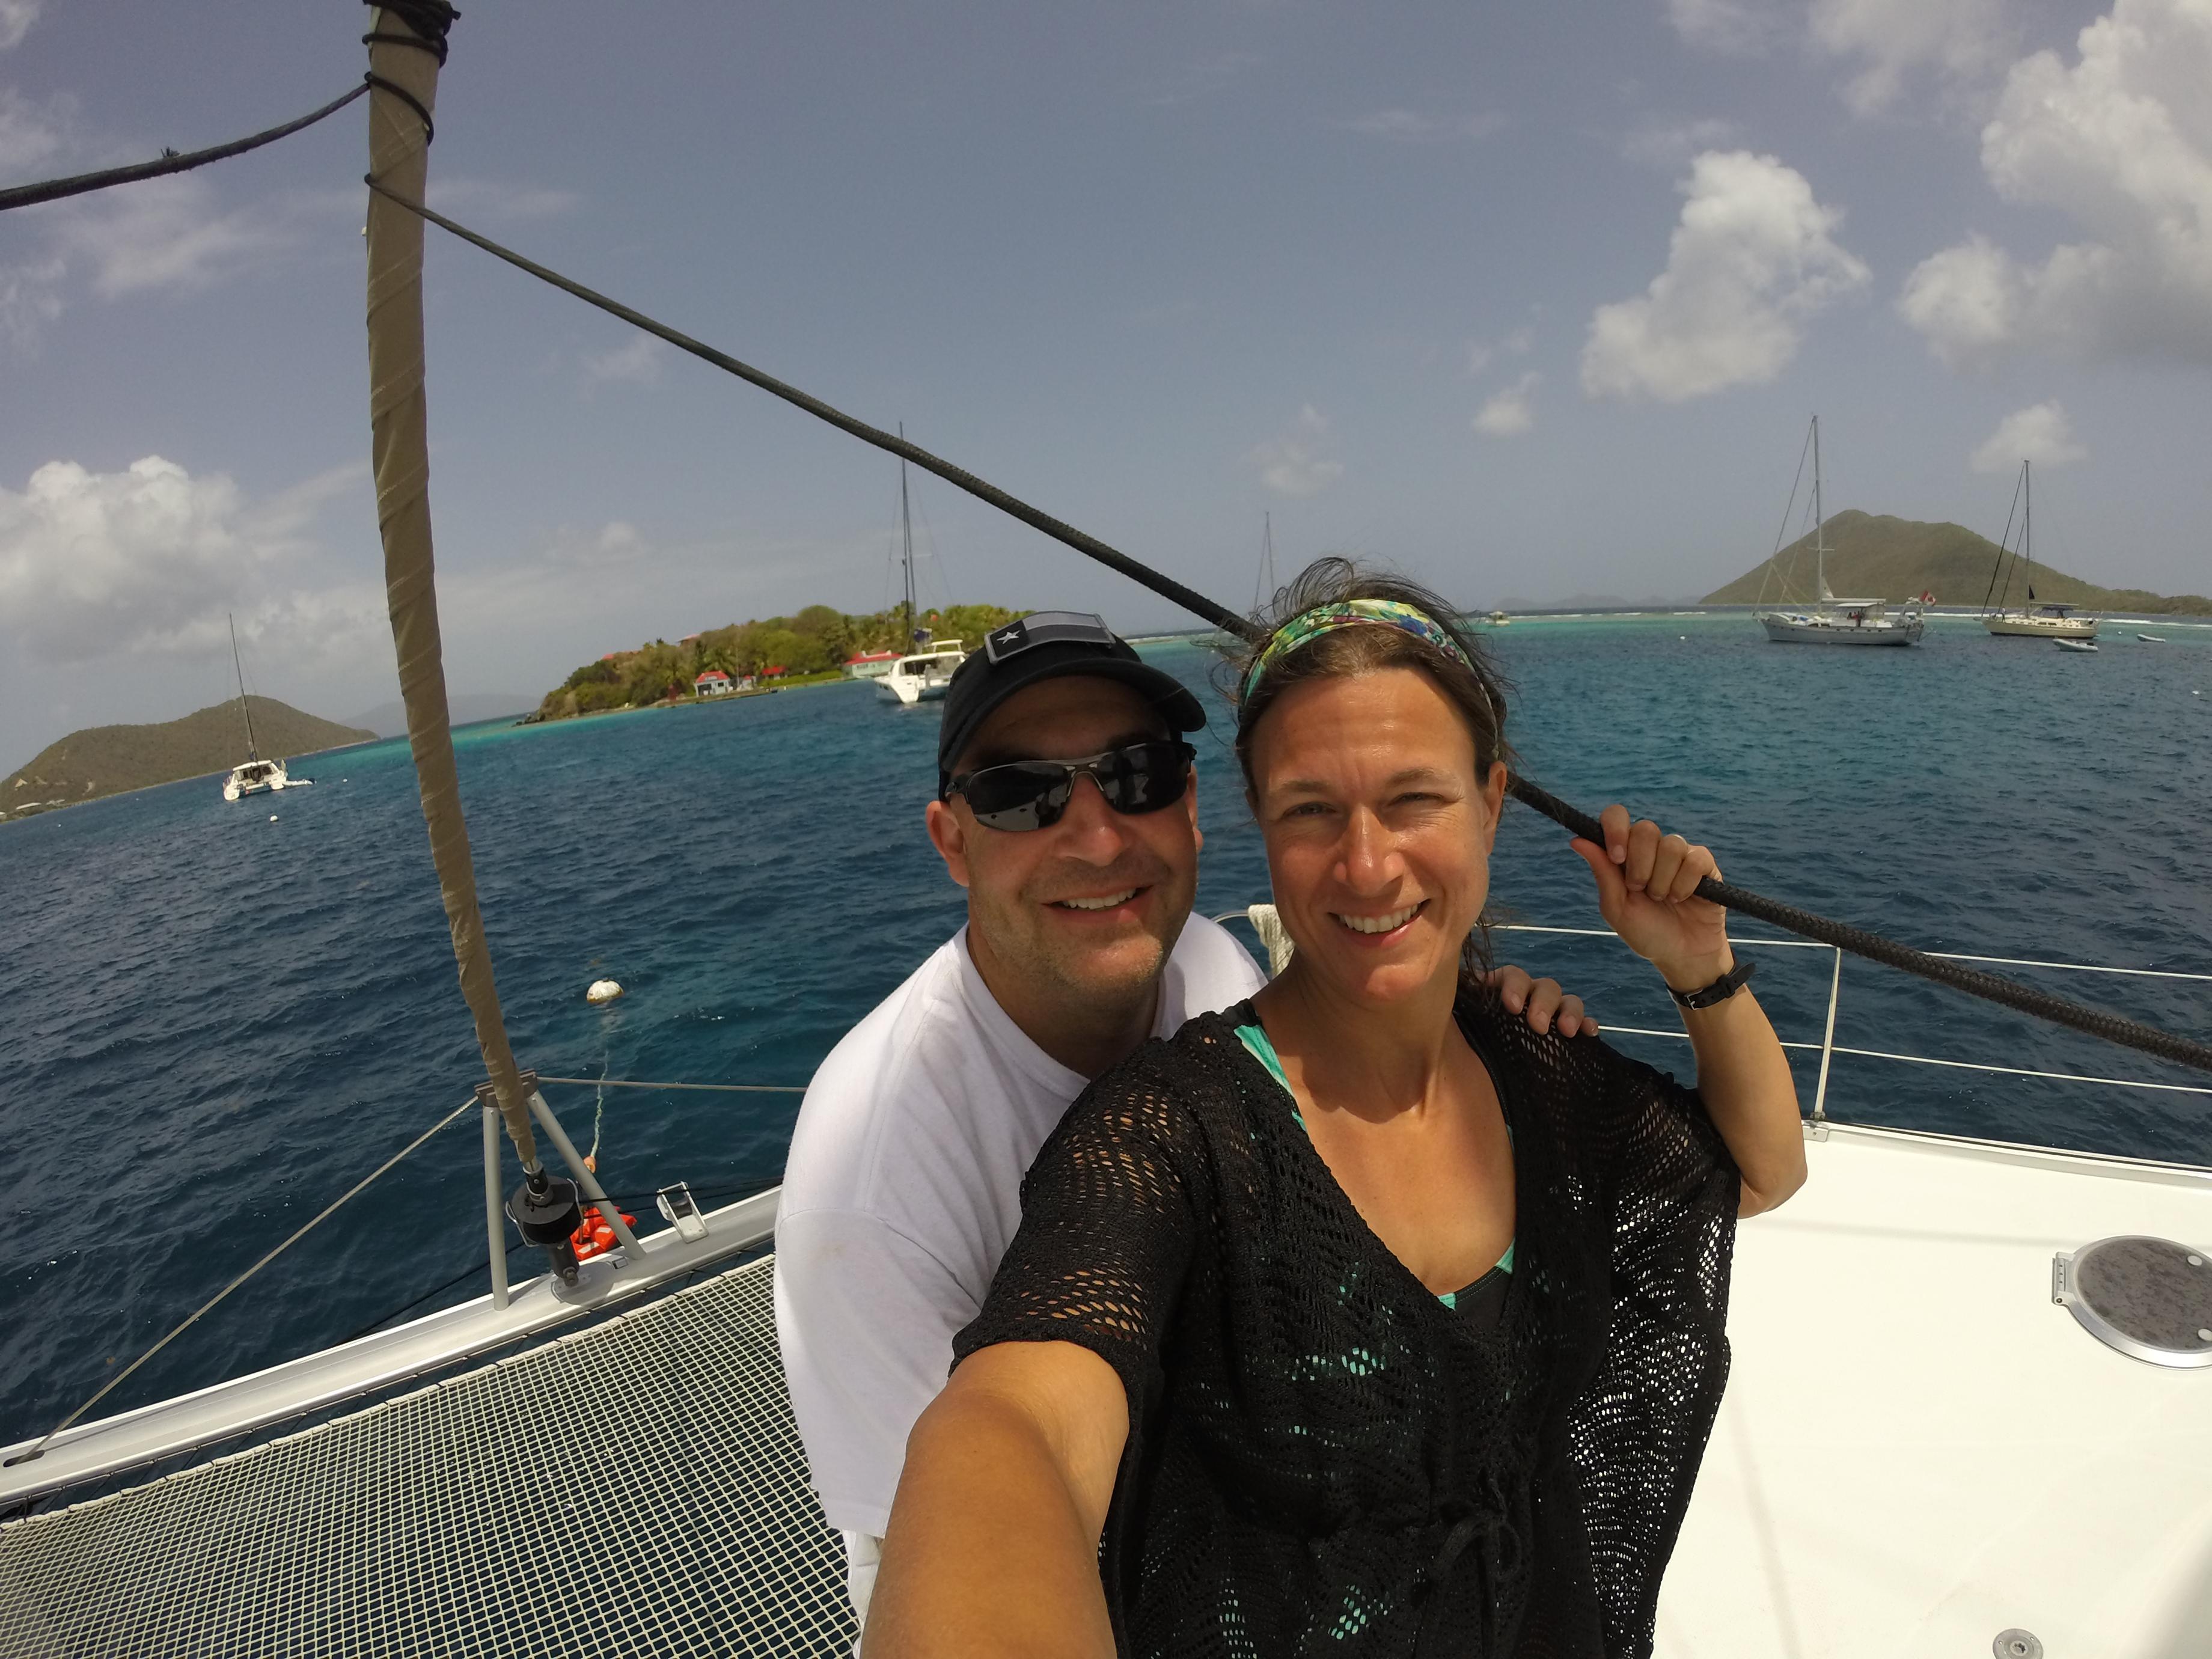 Brian Pinkston and Cheryl Lowry sailing the British Virgin Islands.